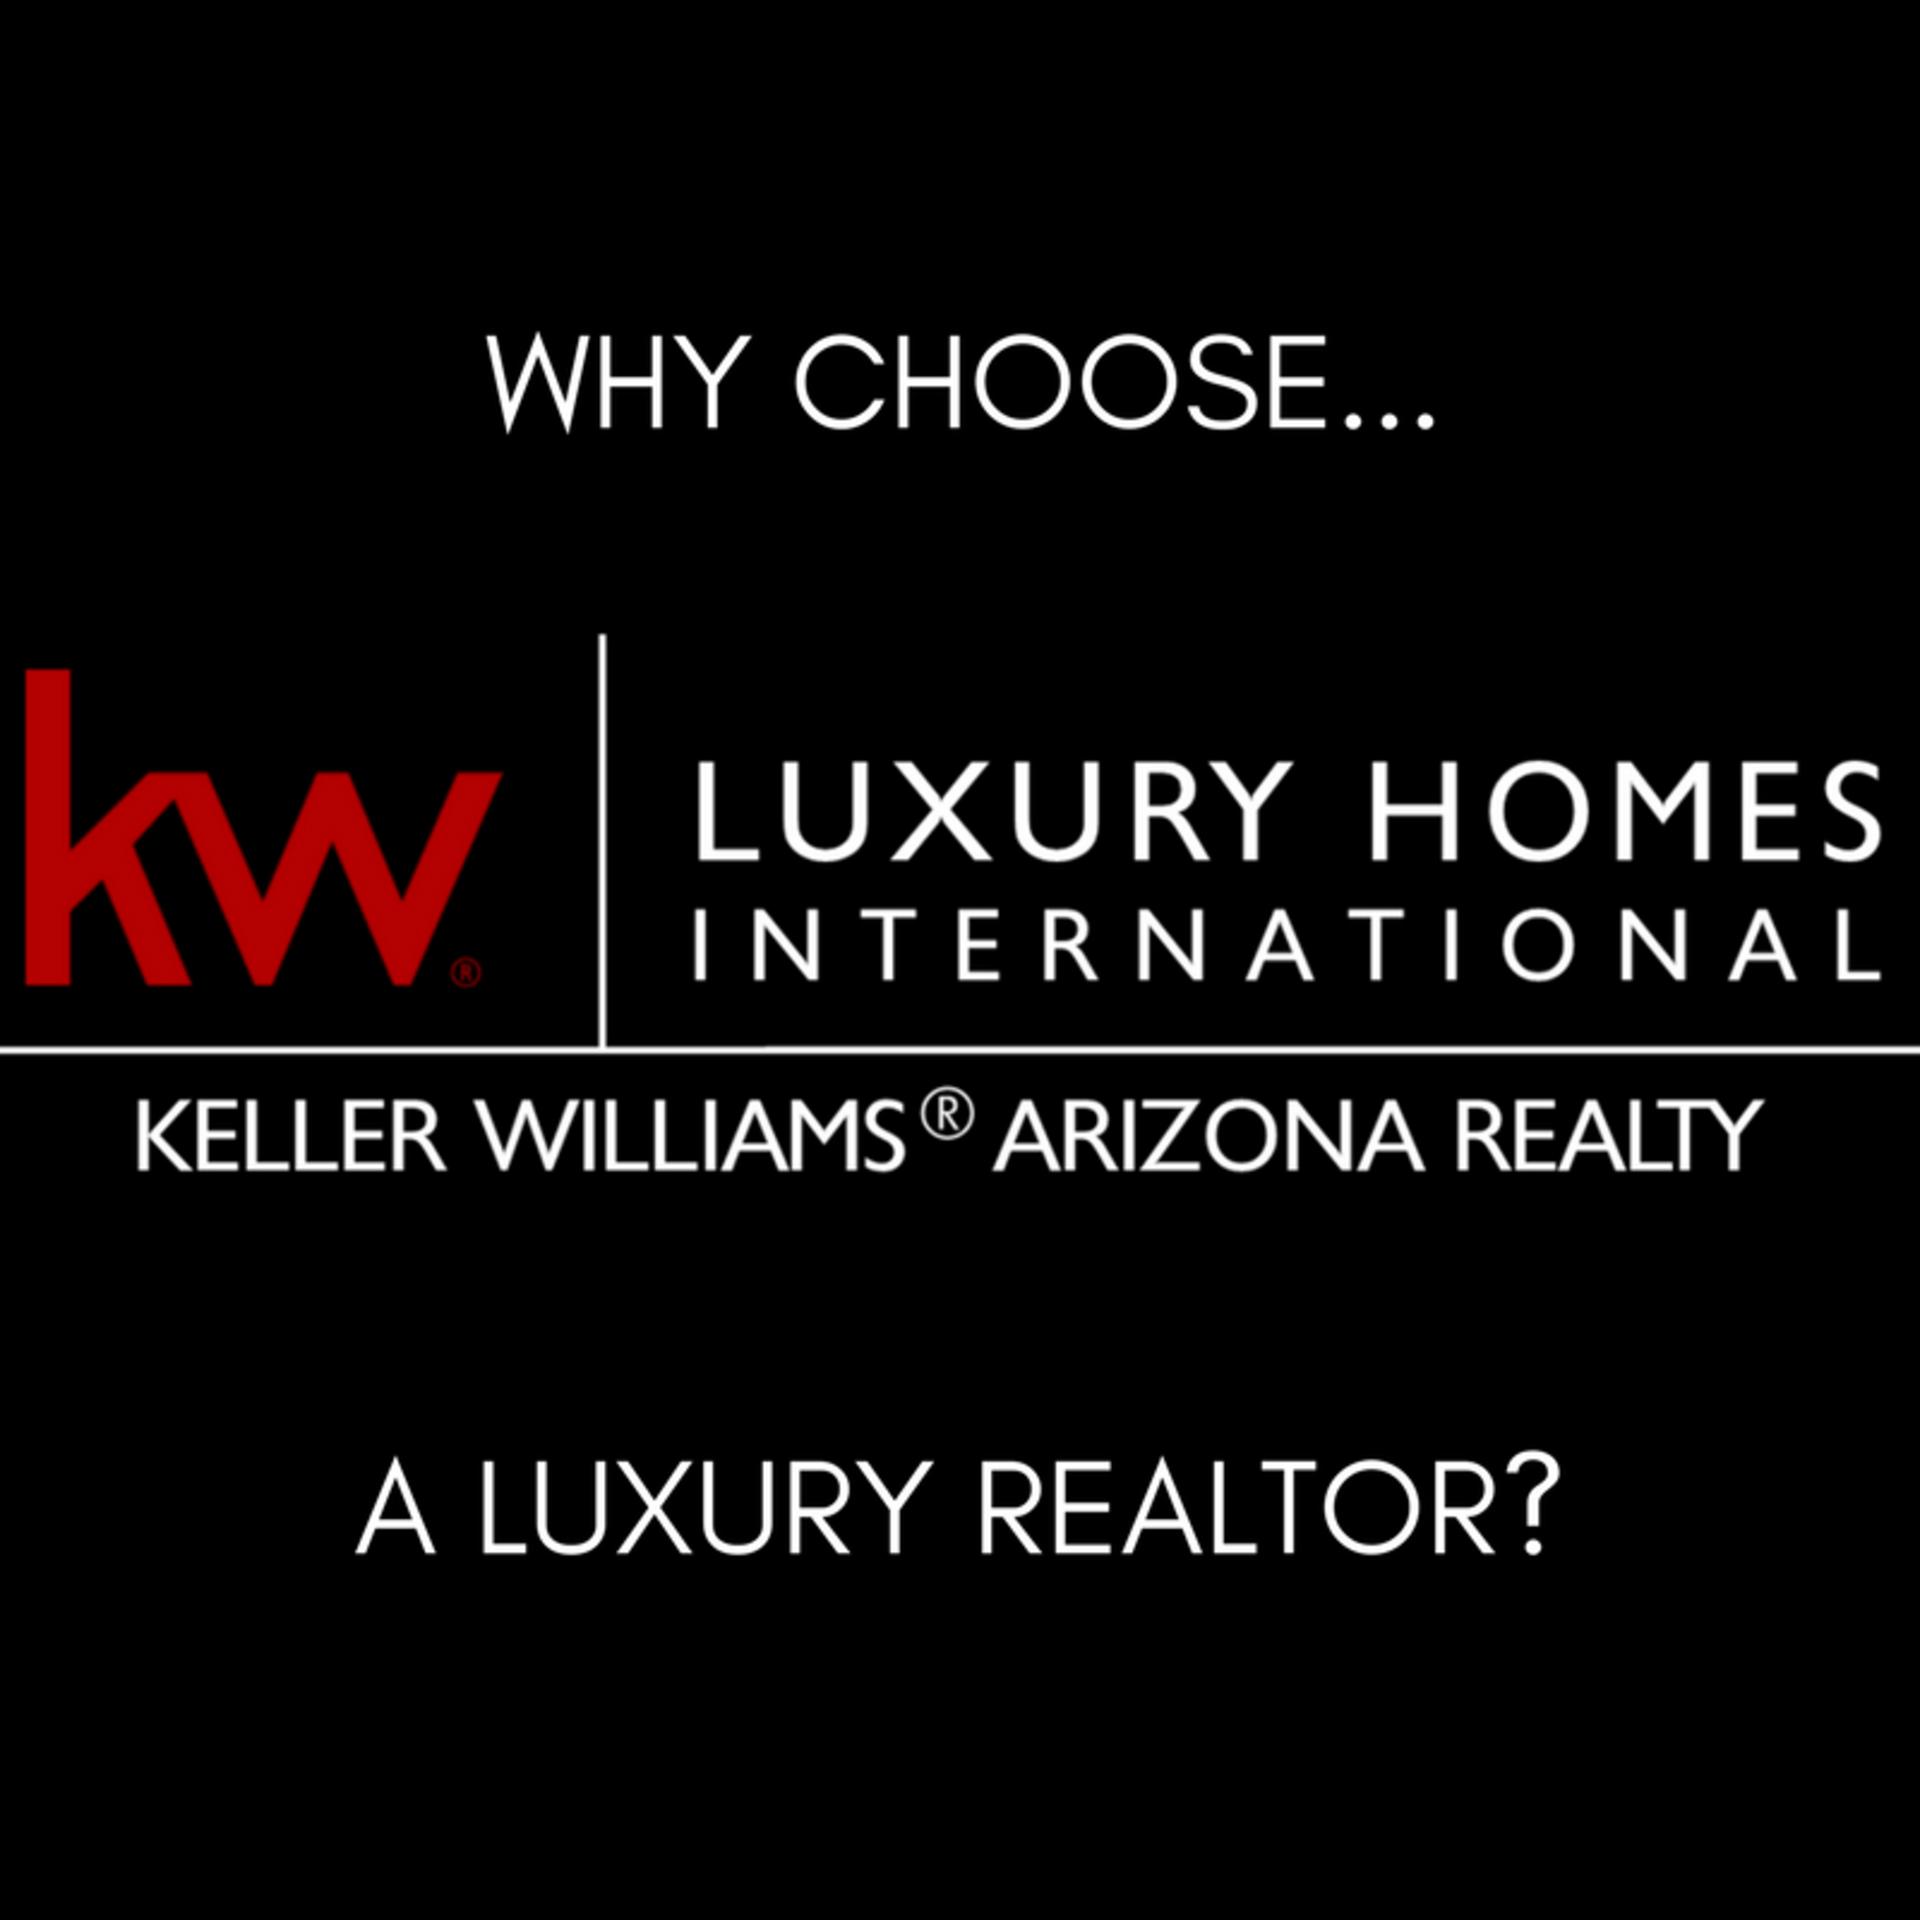 Why Choose a Luxury Realtor